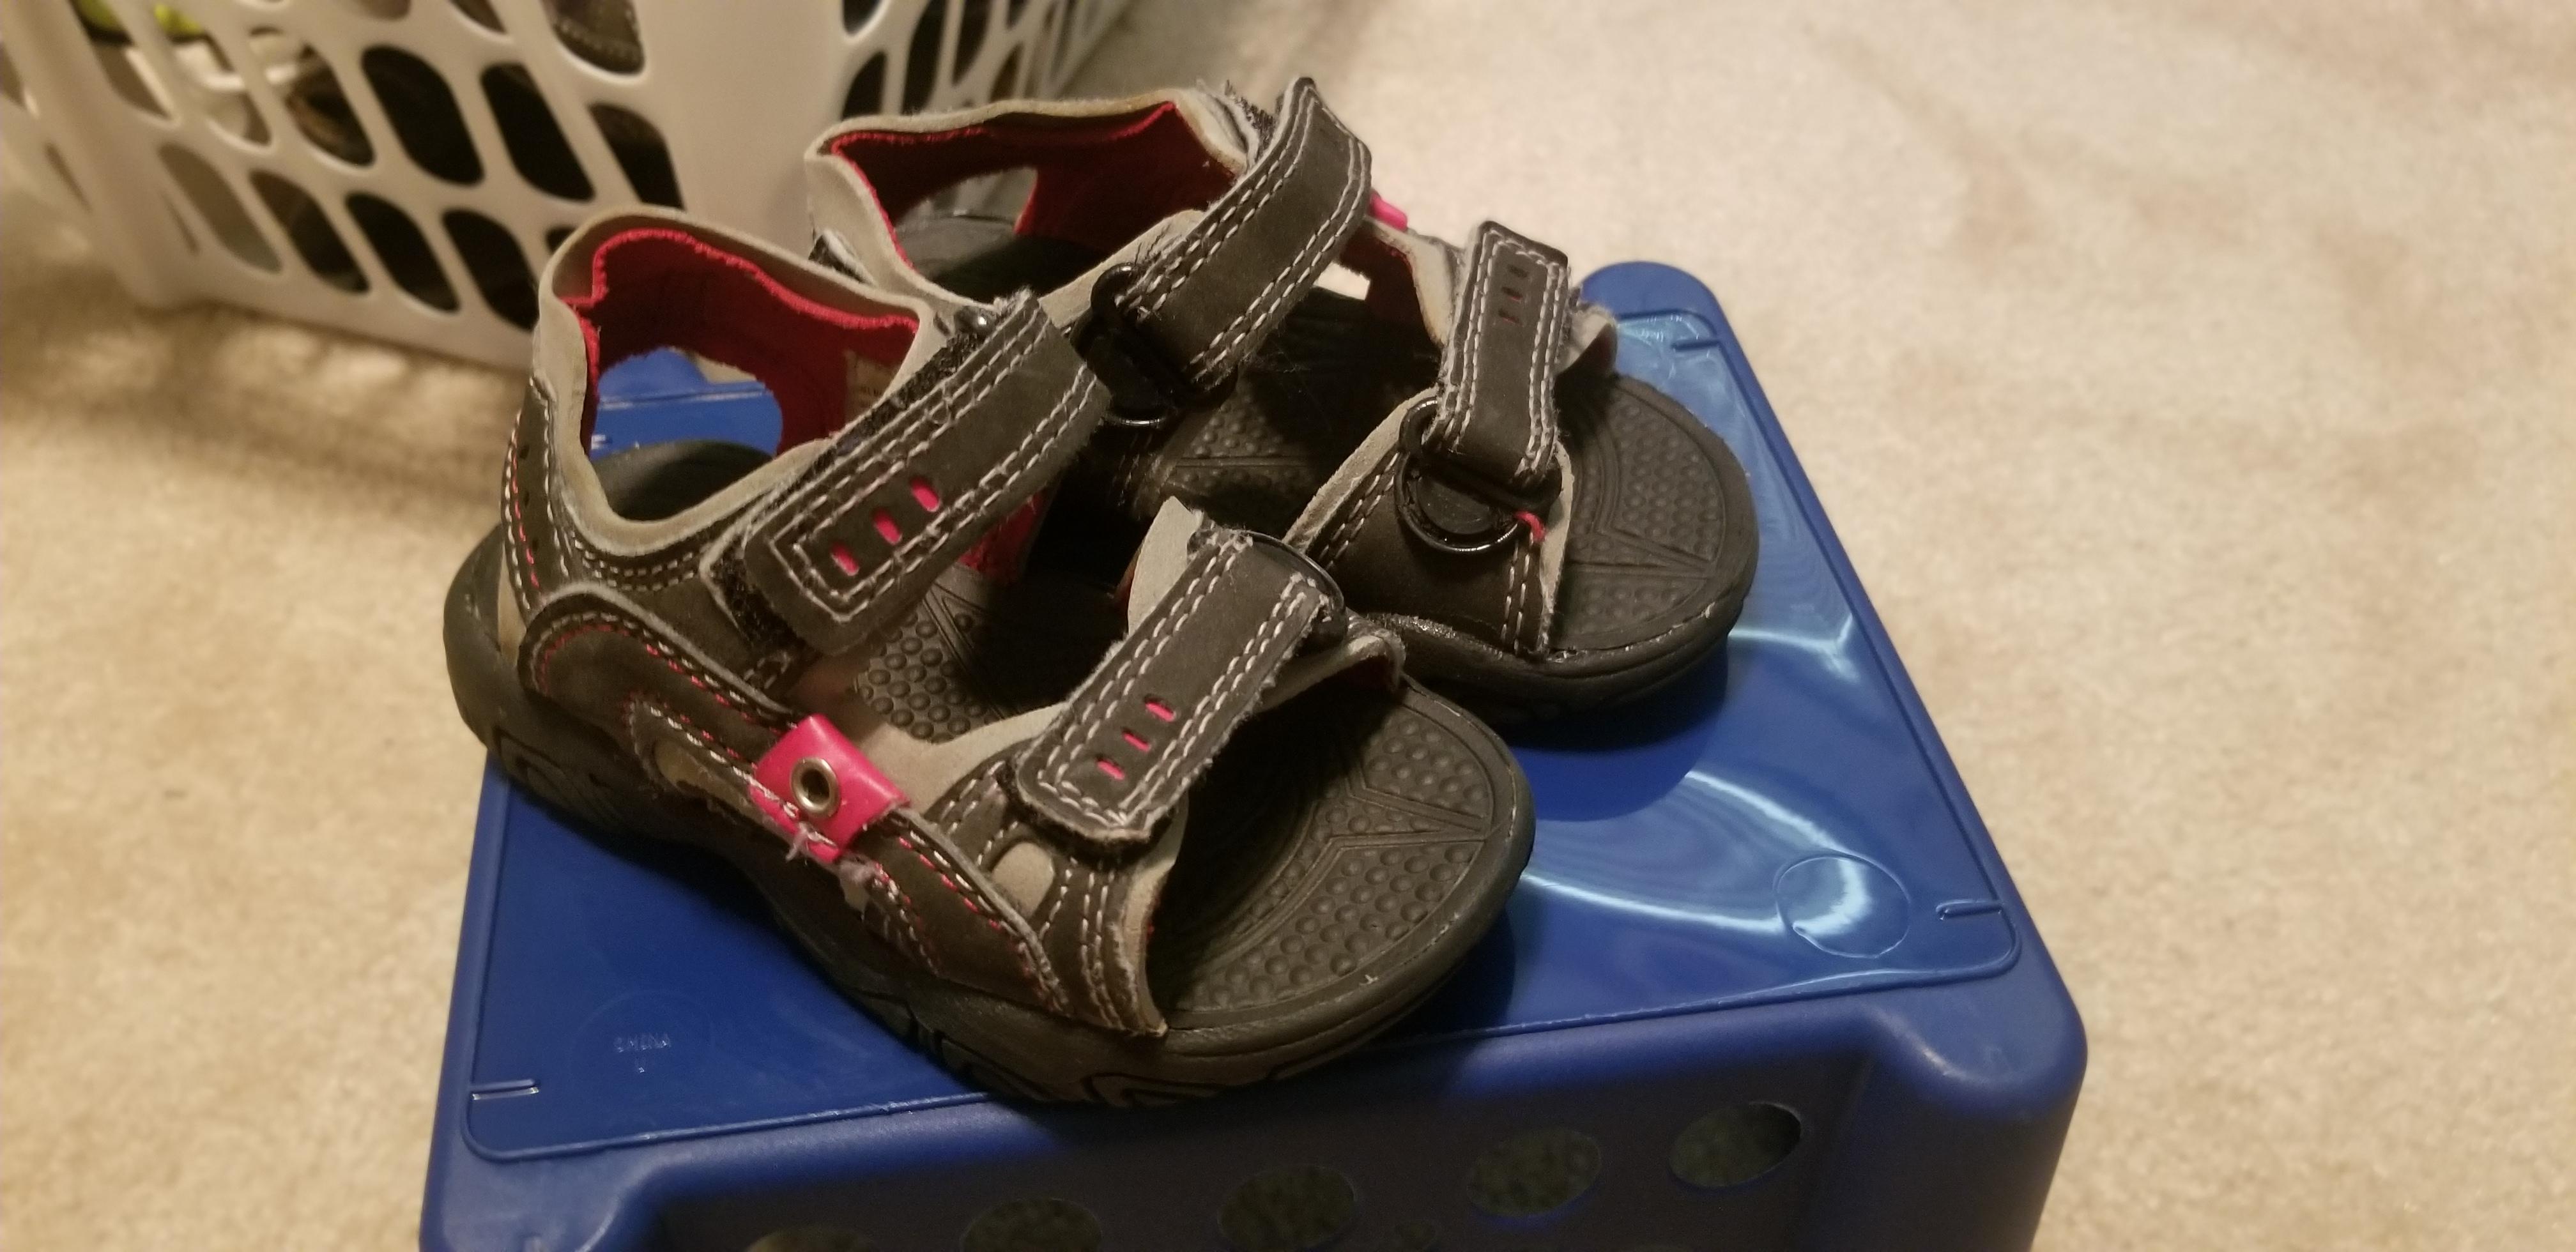 Excellent condition Circo size 5 boys sandals